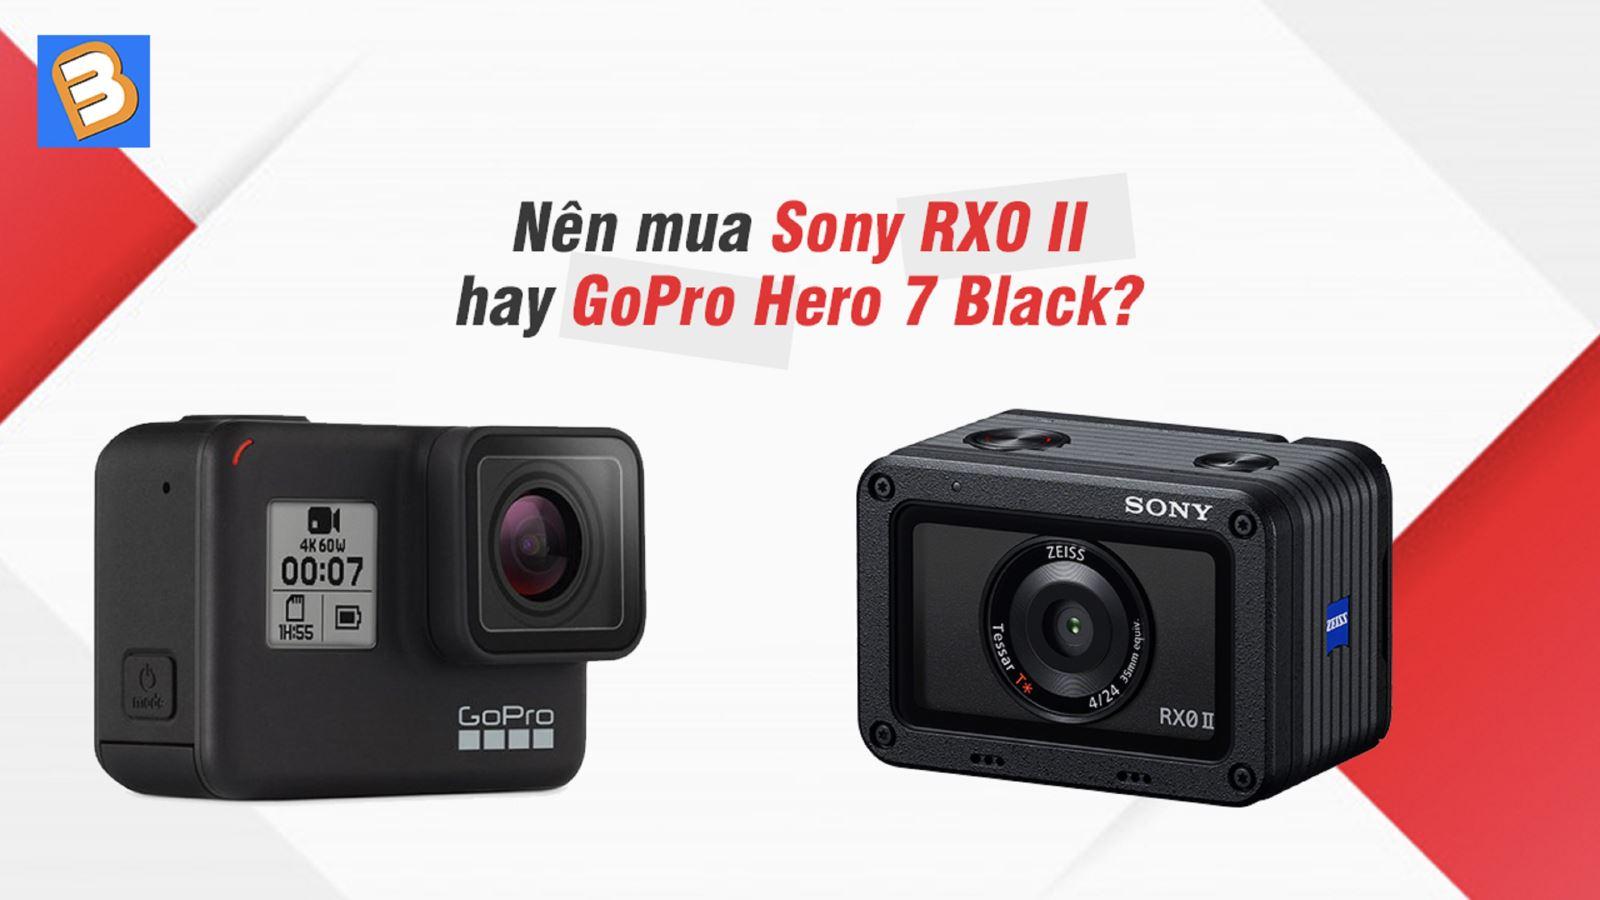 Nên mua Sony RX0 II hay GoPro Hero 7 Black